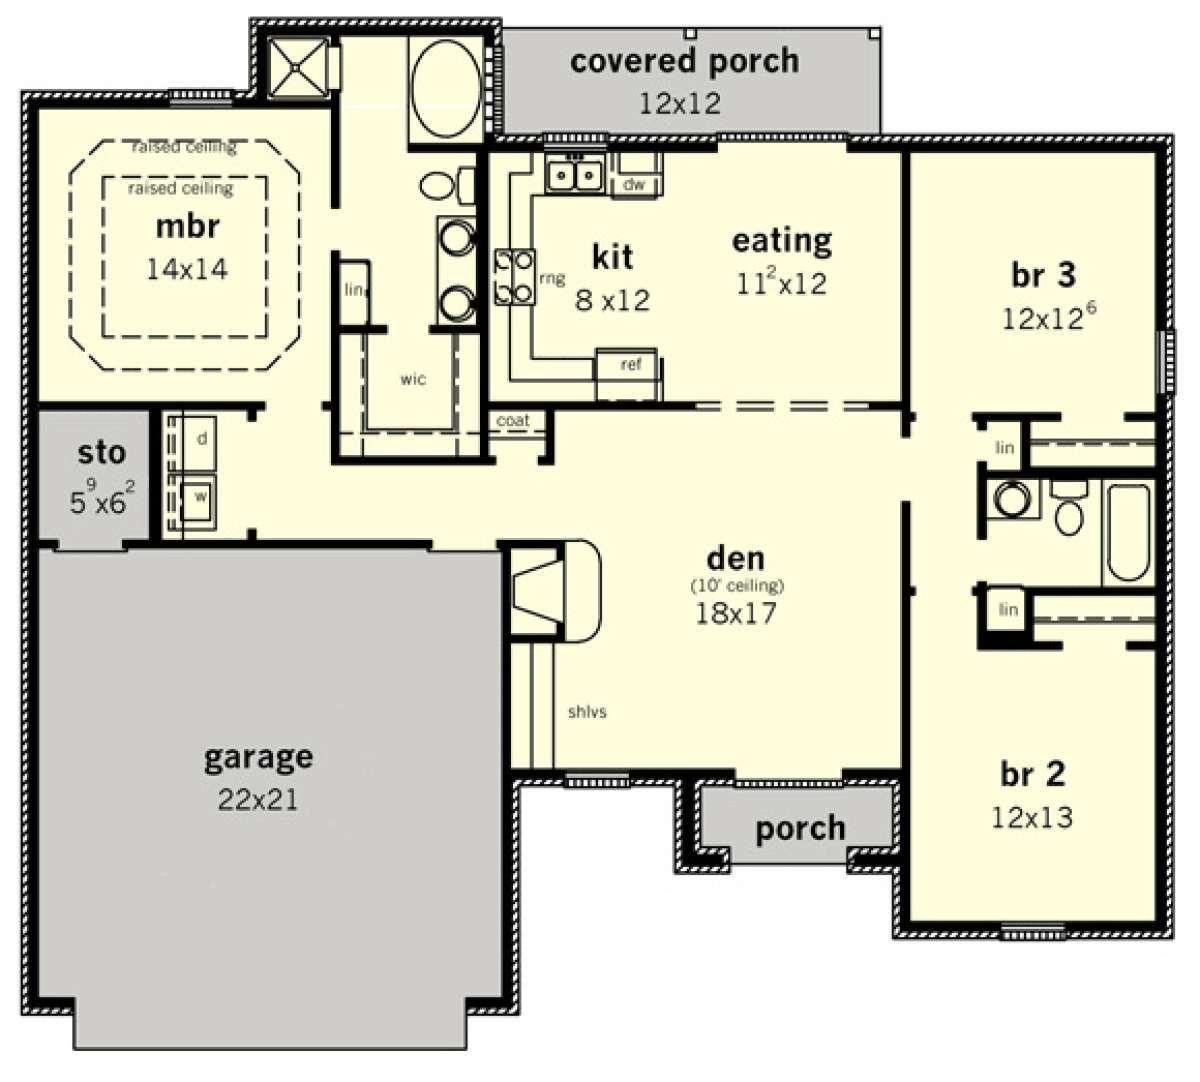 House Plan 9035 00060 European Plan 1 470 Square Feet 3 Bedrooms 2 Bathrooms Southern House Plans House Plans Floor Plans